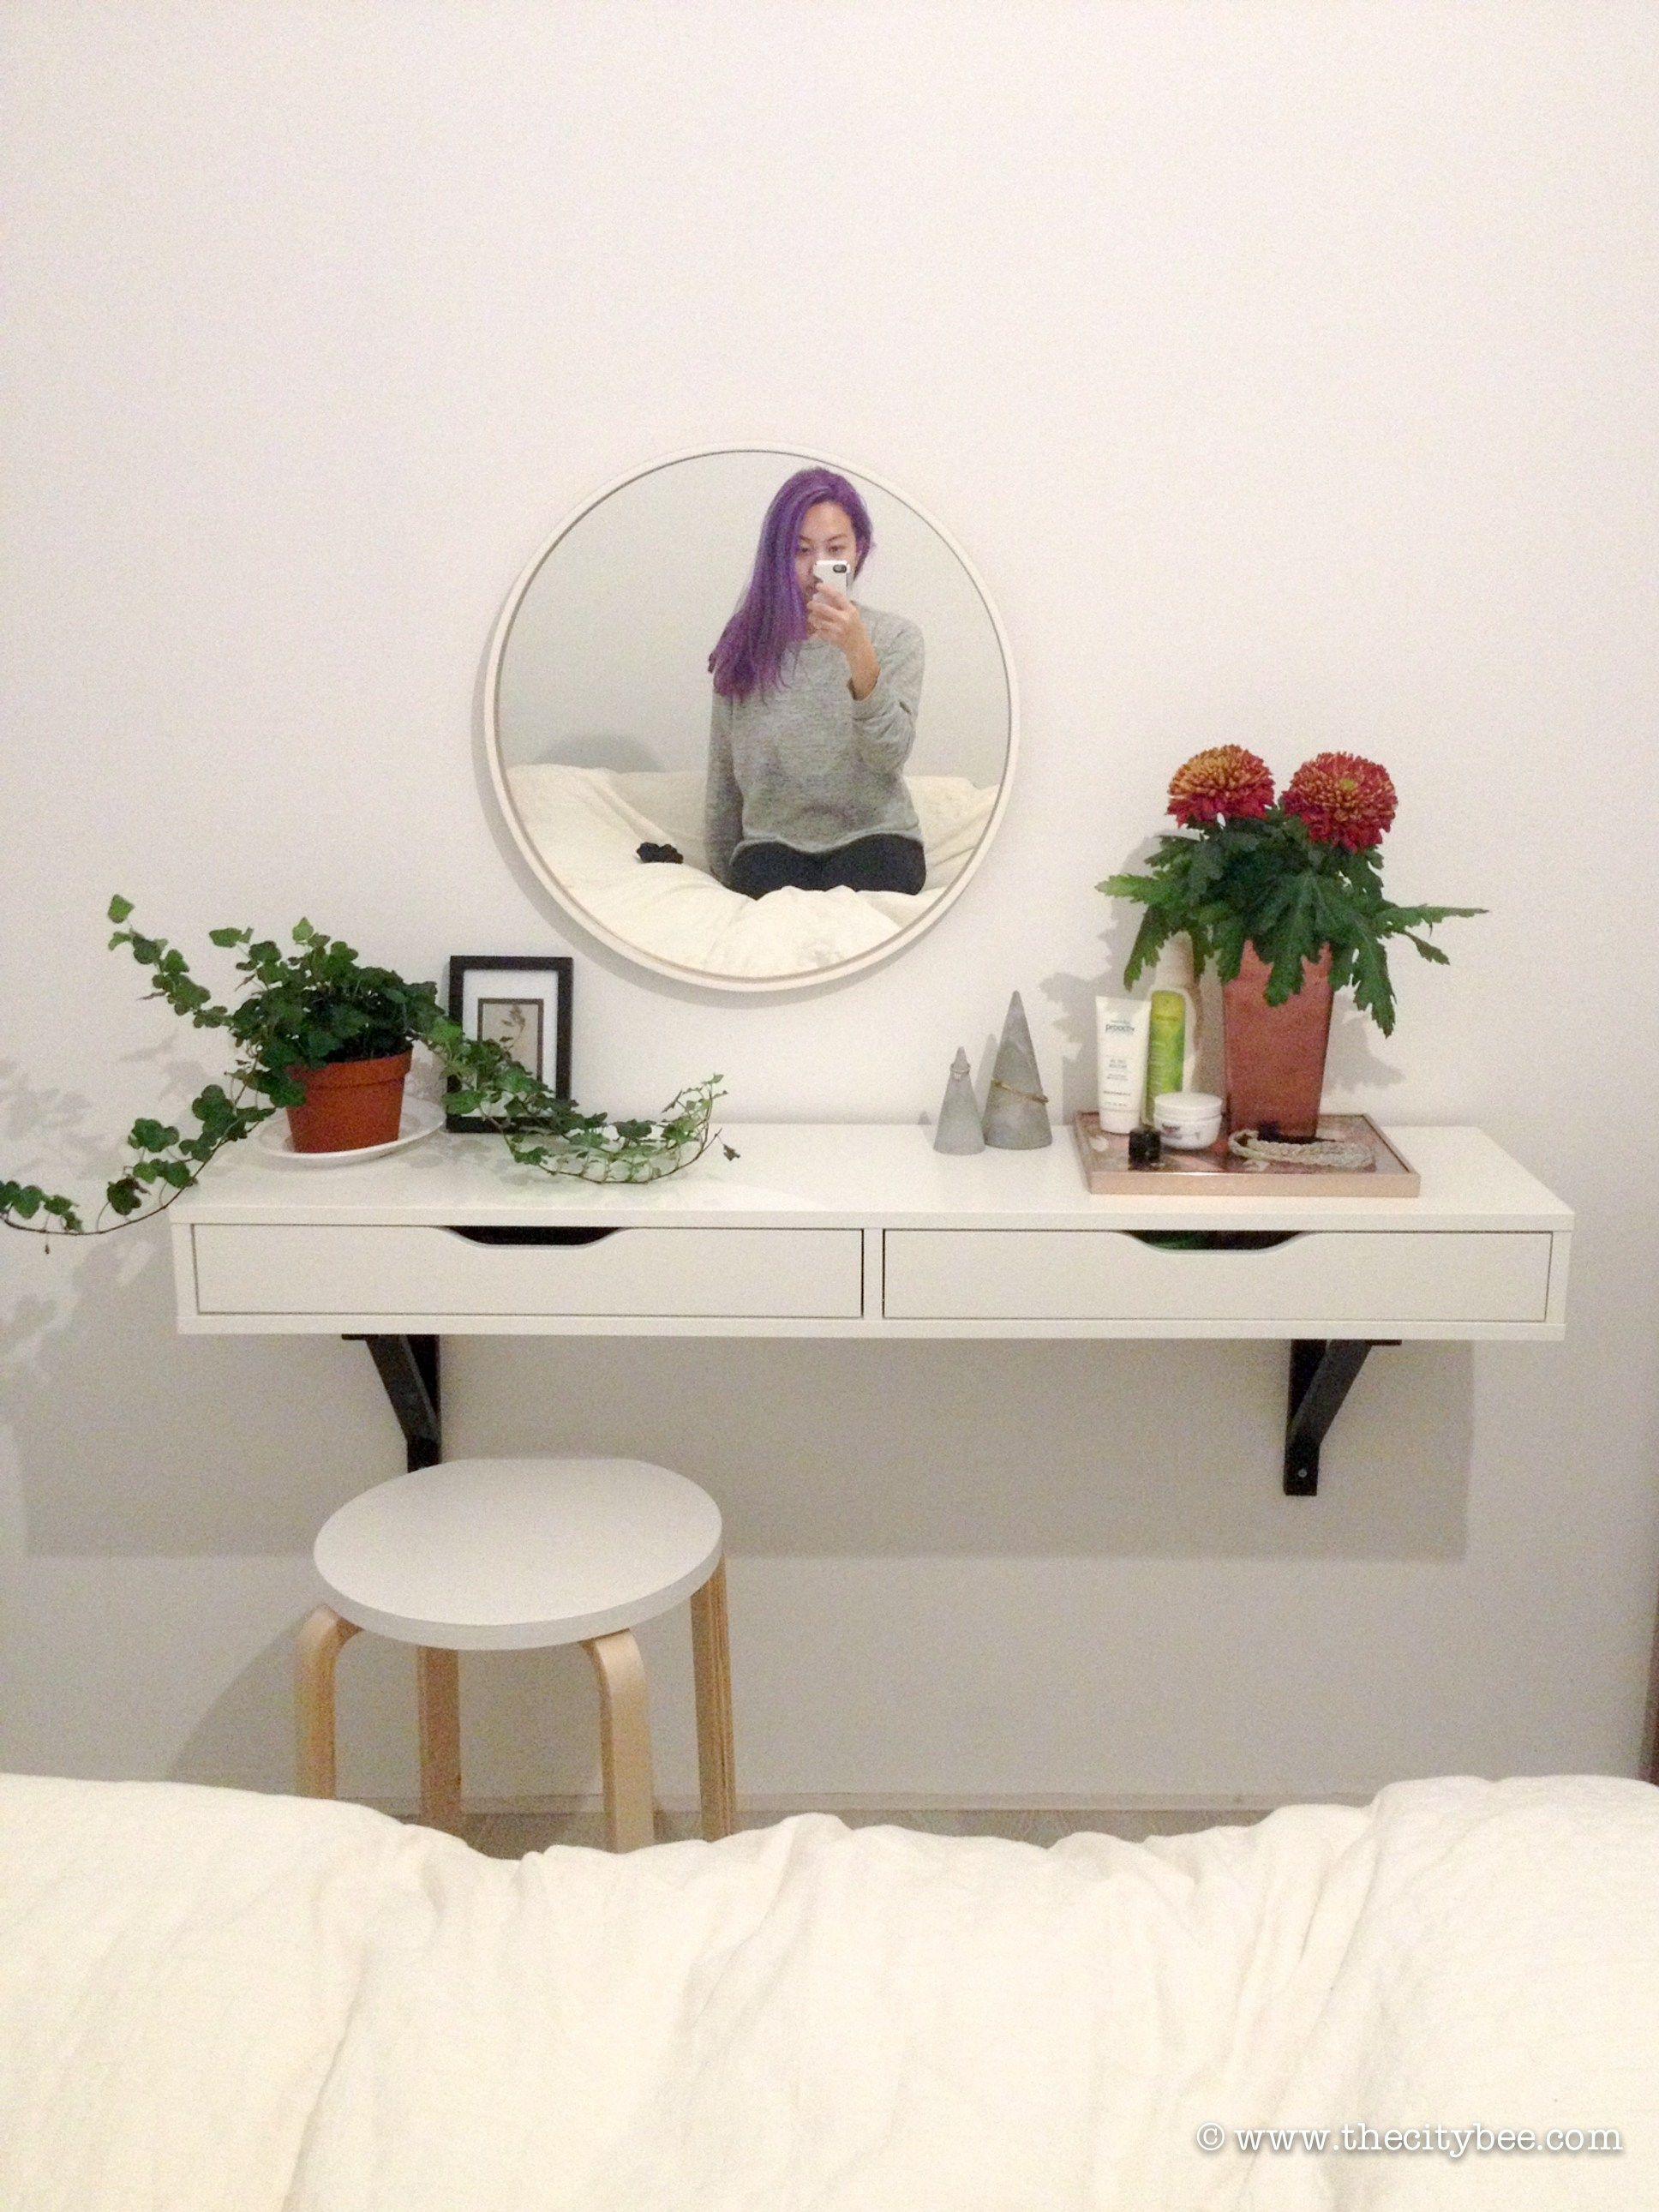 Acrylic Beauty Sponge Organizer & Drying House Provides 9 Space ...